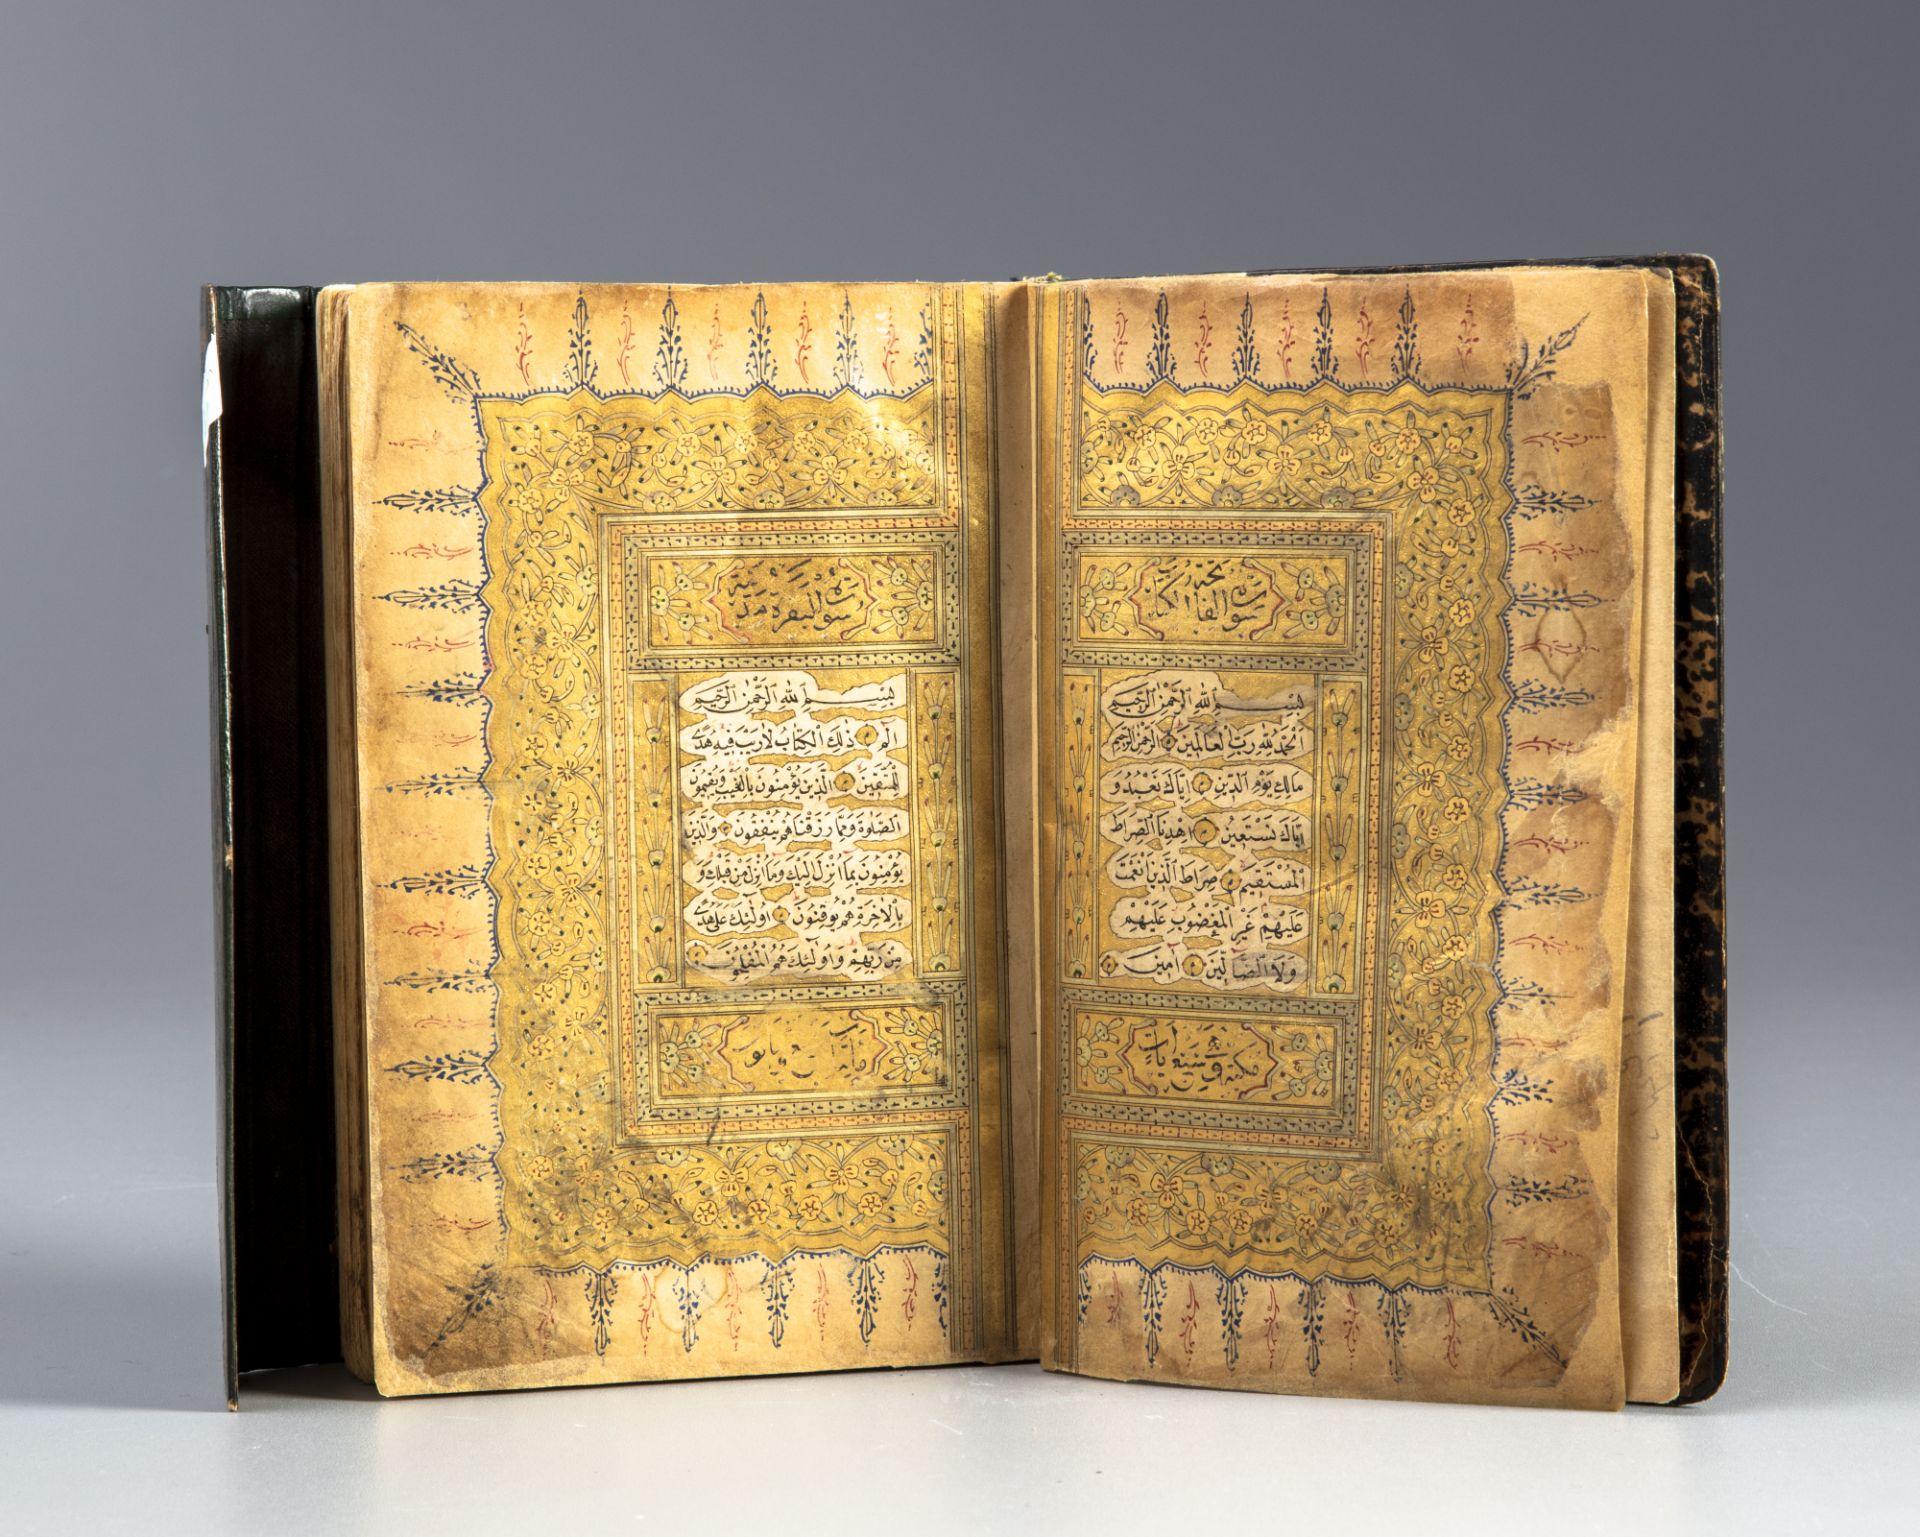 An Ottoman gilt decorated Quran